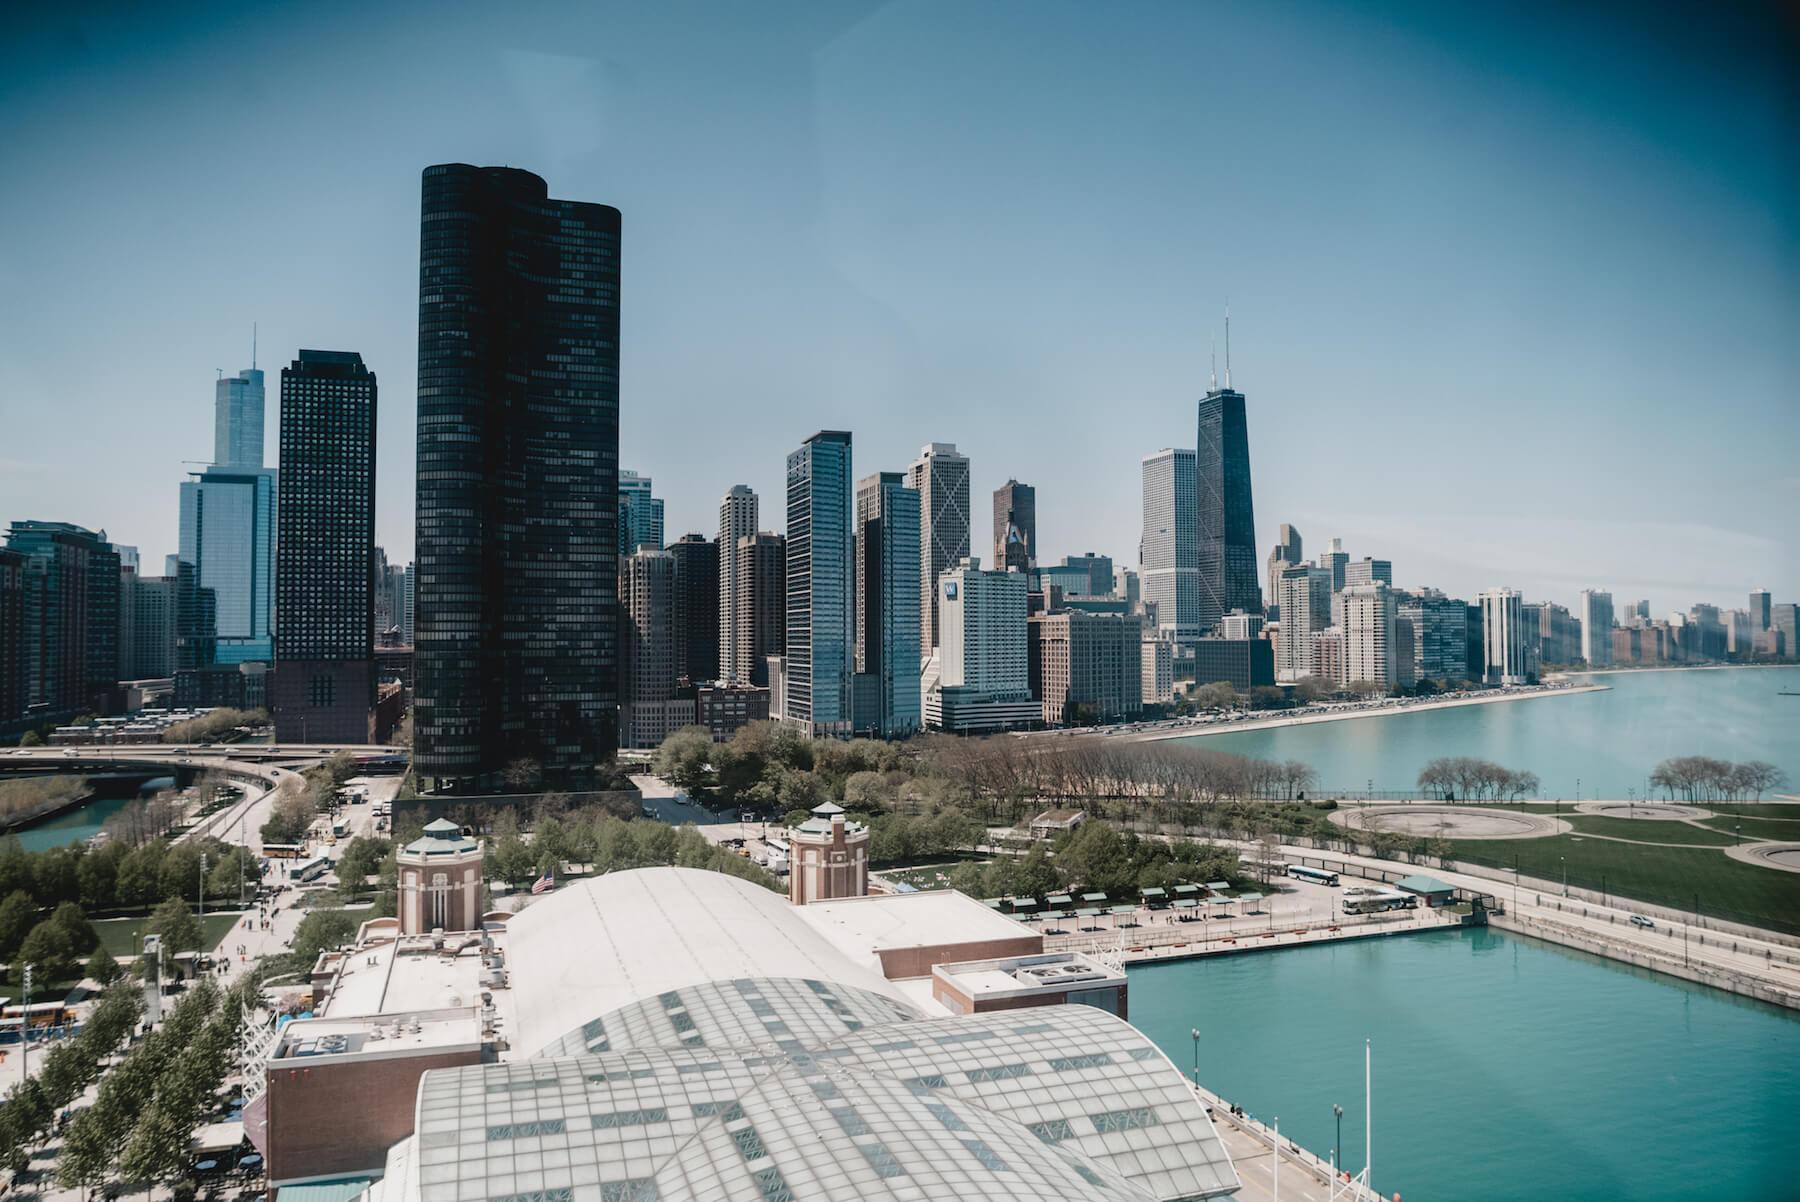 engle-olson-chicago-family-reunion-10.jpg